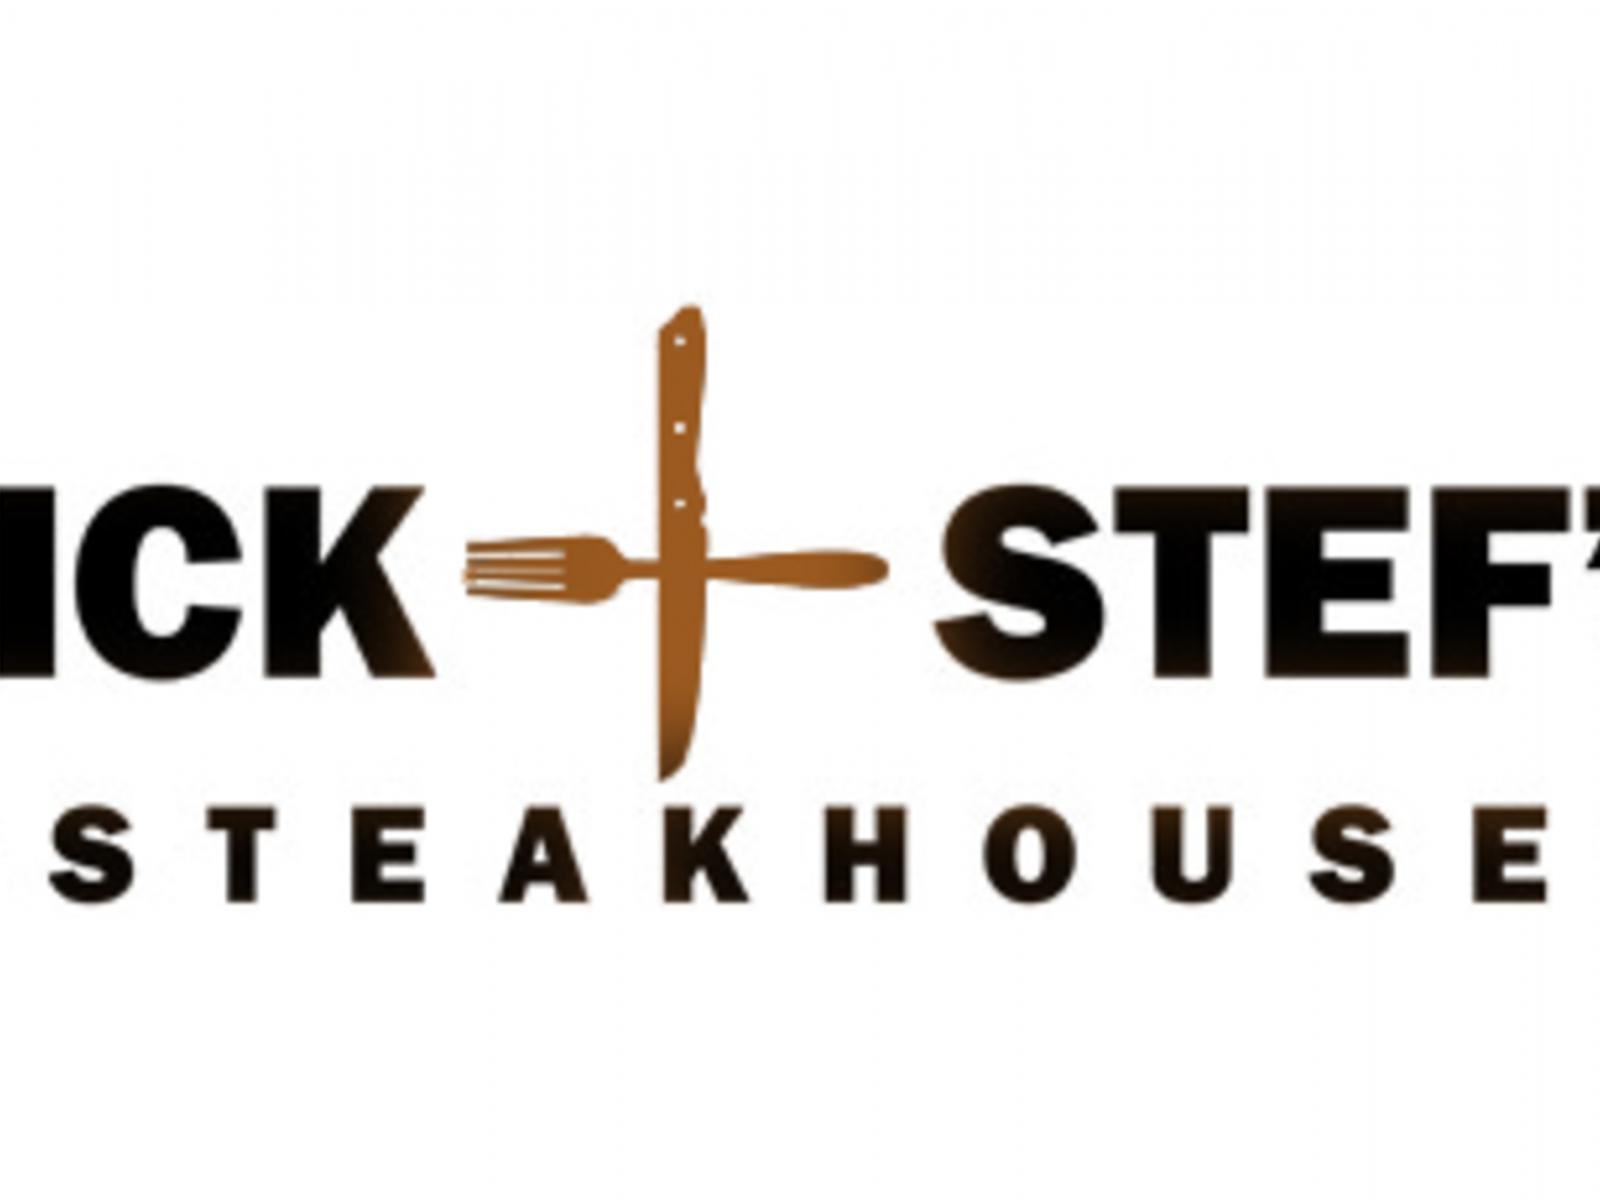 Nick + Stef's Steakhouse